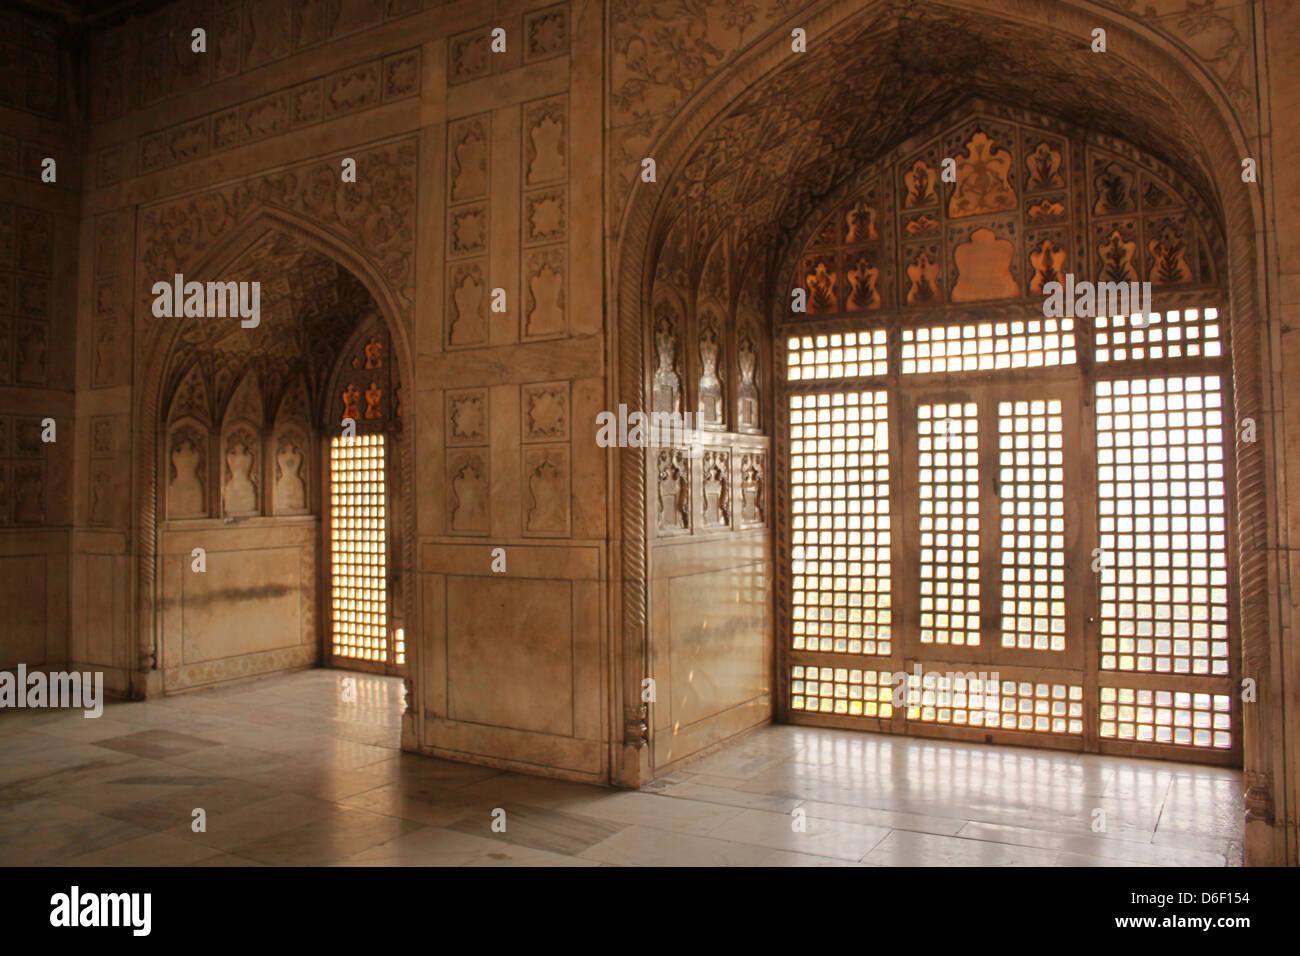 Highly ornate interiors of Agra Fort  UNESCO World Heritage site Agra, Uttar Pradesh, India - Stock Image